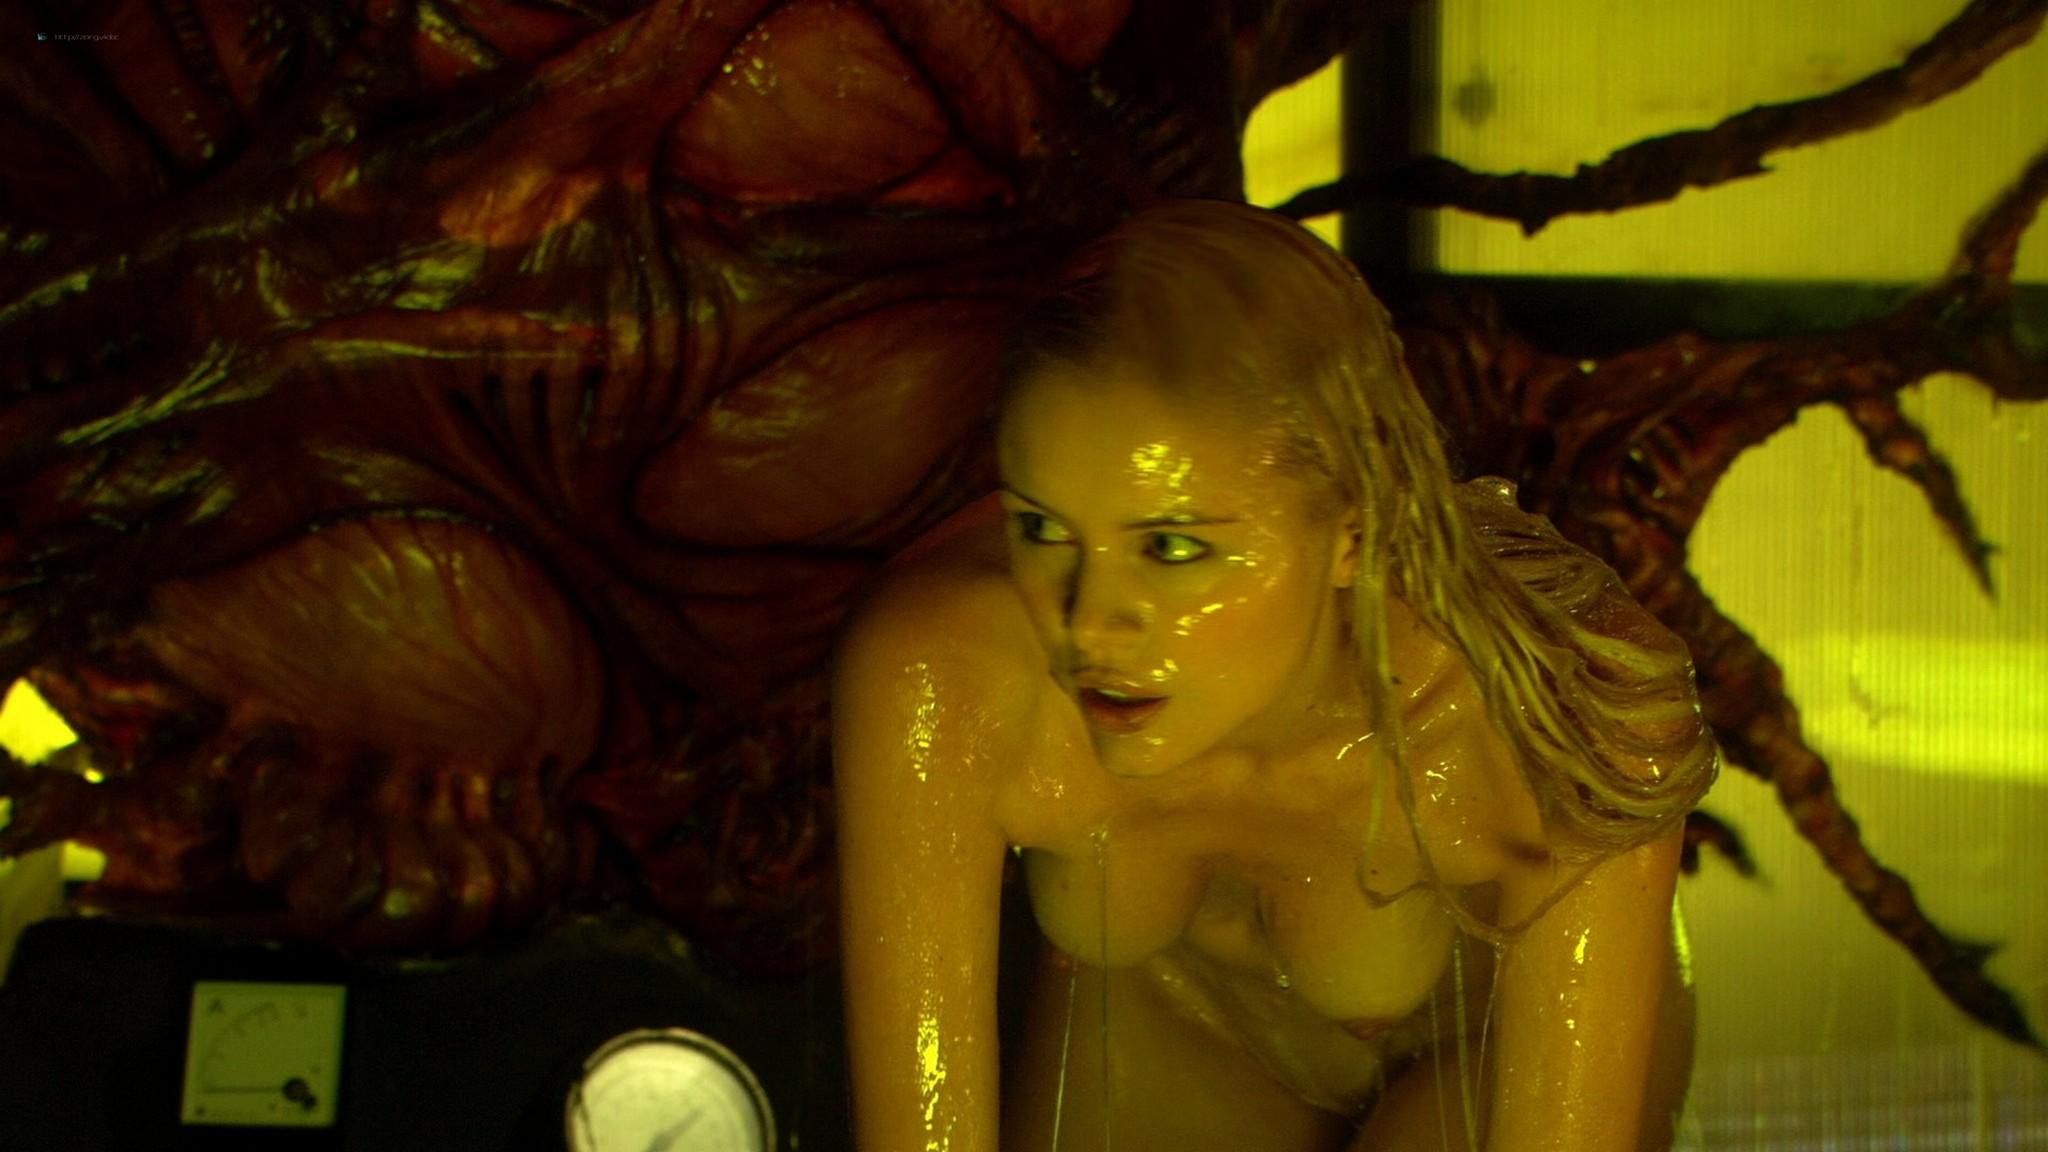 Helena Mattsson nude full frontal and Marlene Favela nude Species The Awakening 2007 HD 1080p BluRay REMUX 007